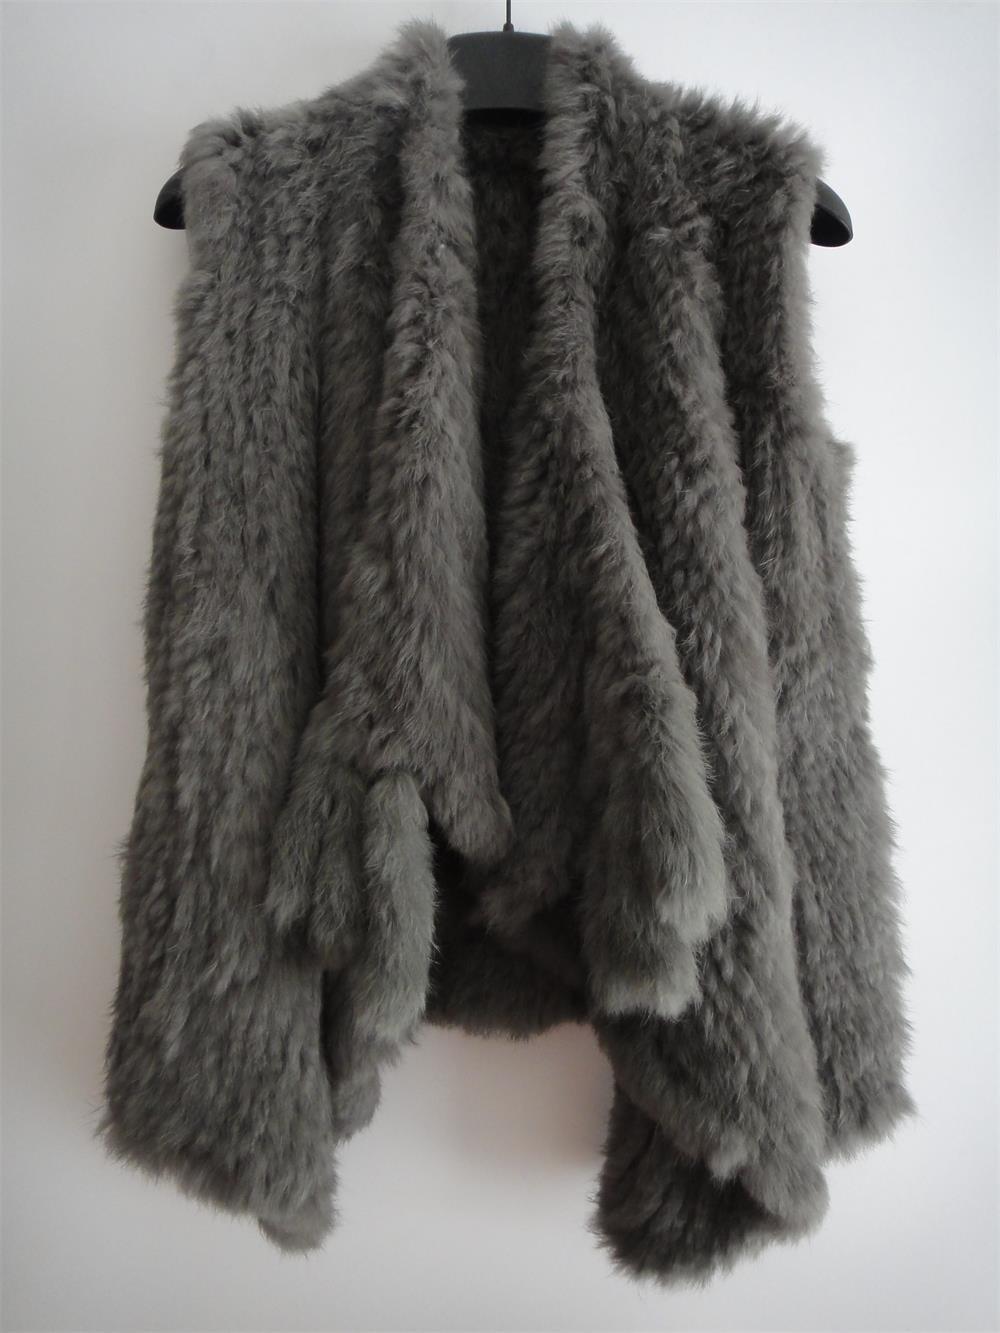 Dark Grey Knit Rabbit Fur Sweater Vest Fur Gilet